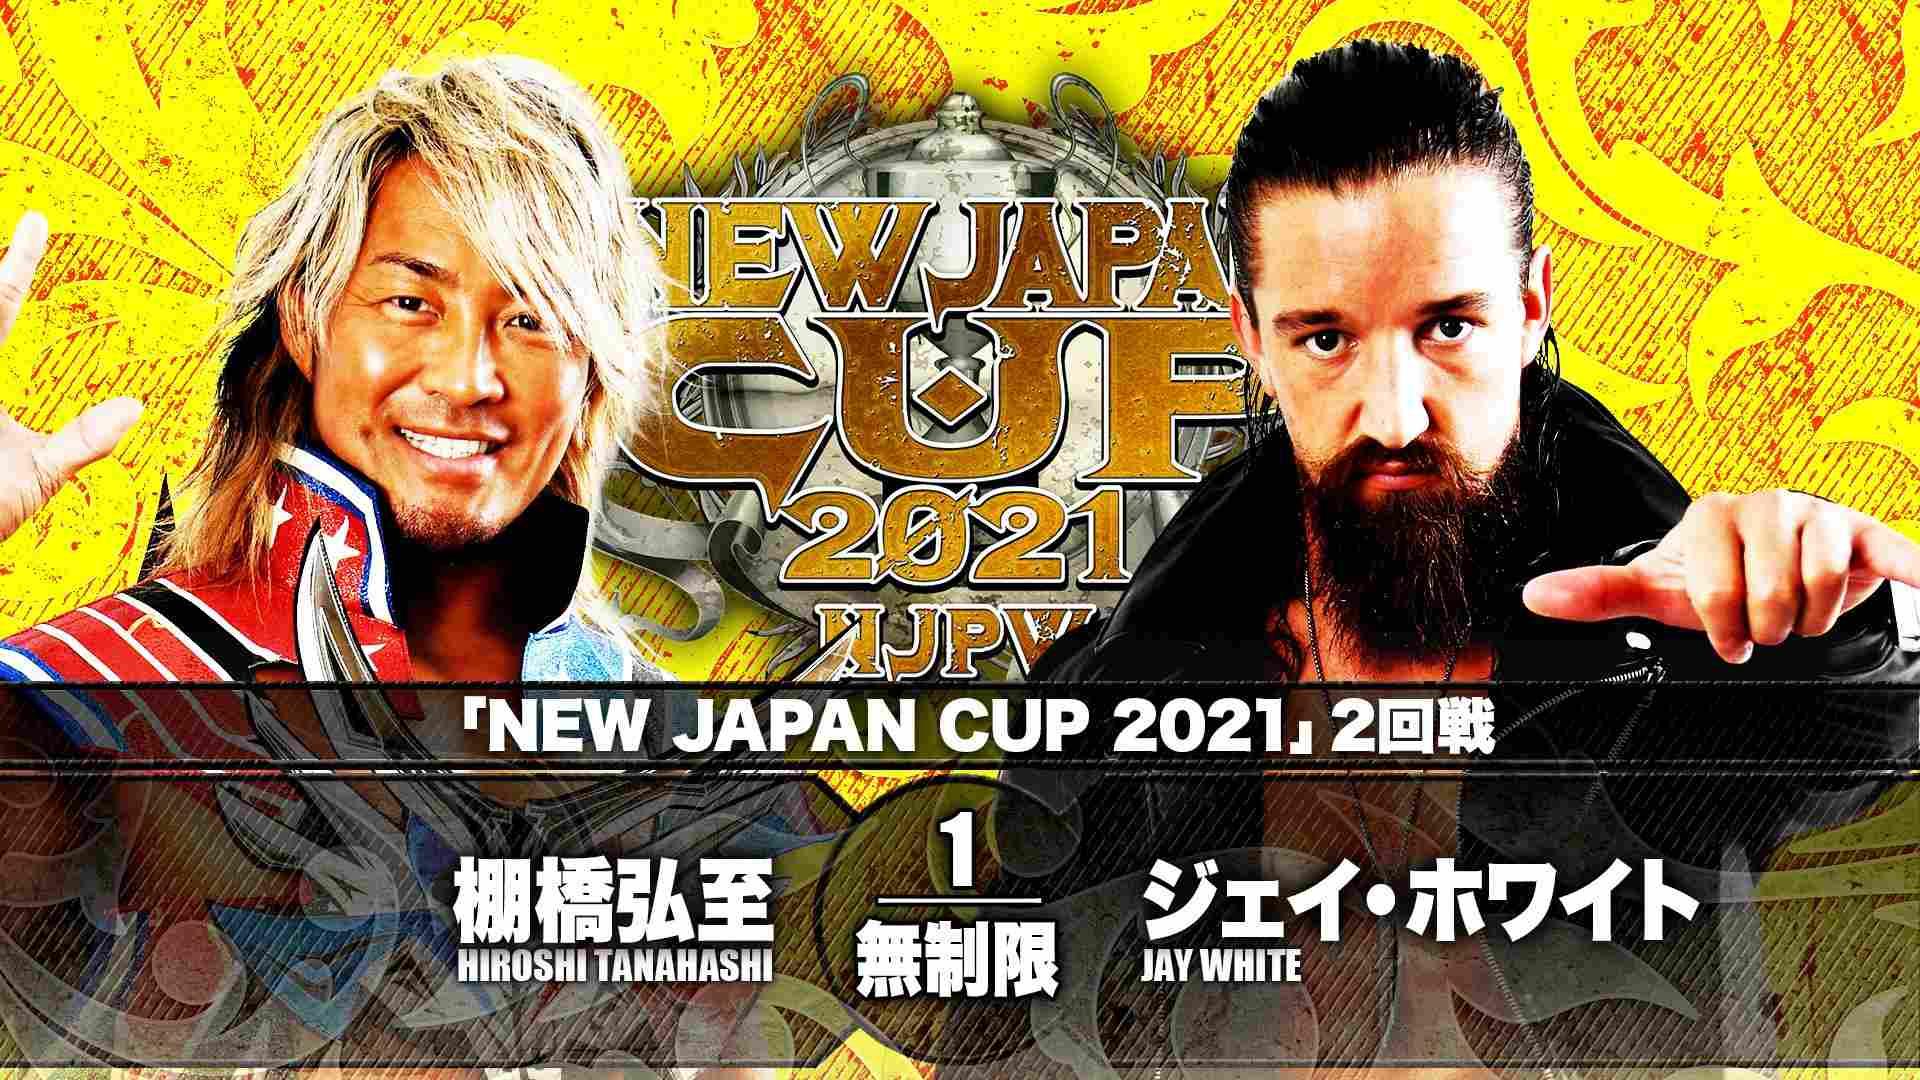 tanahashi vs white nj cup 2021 compressed